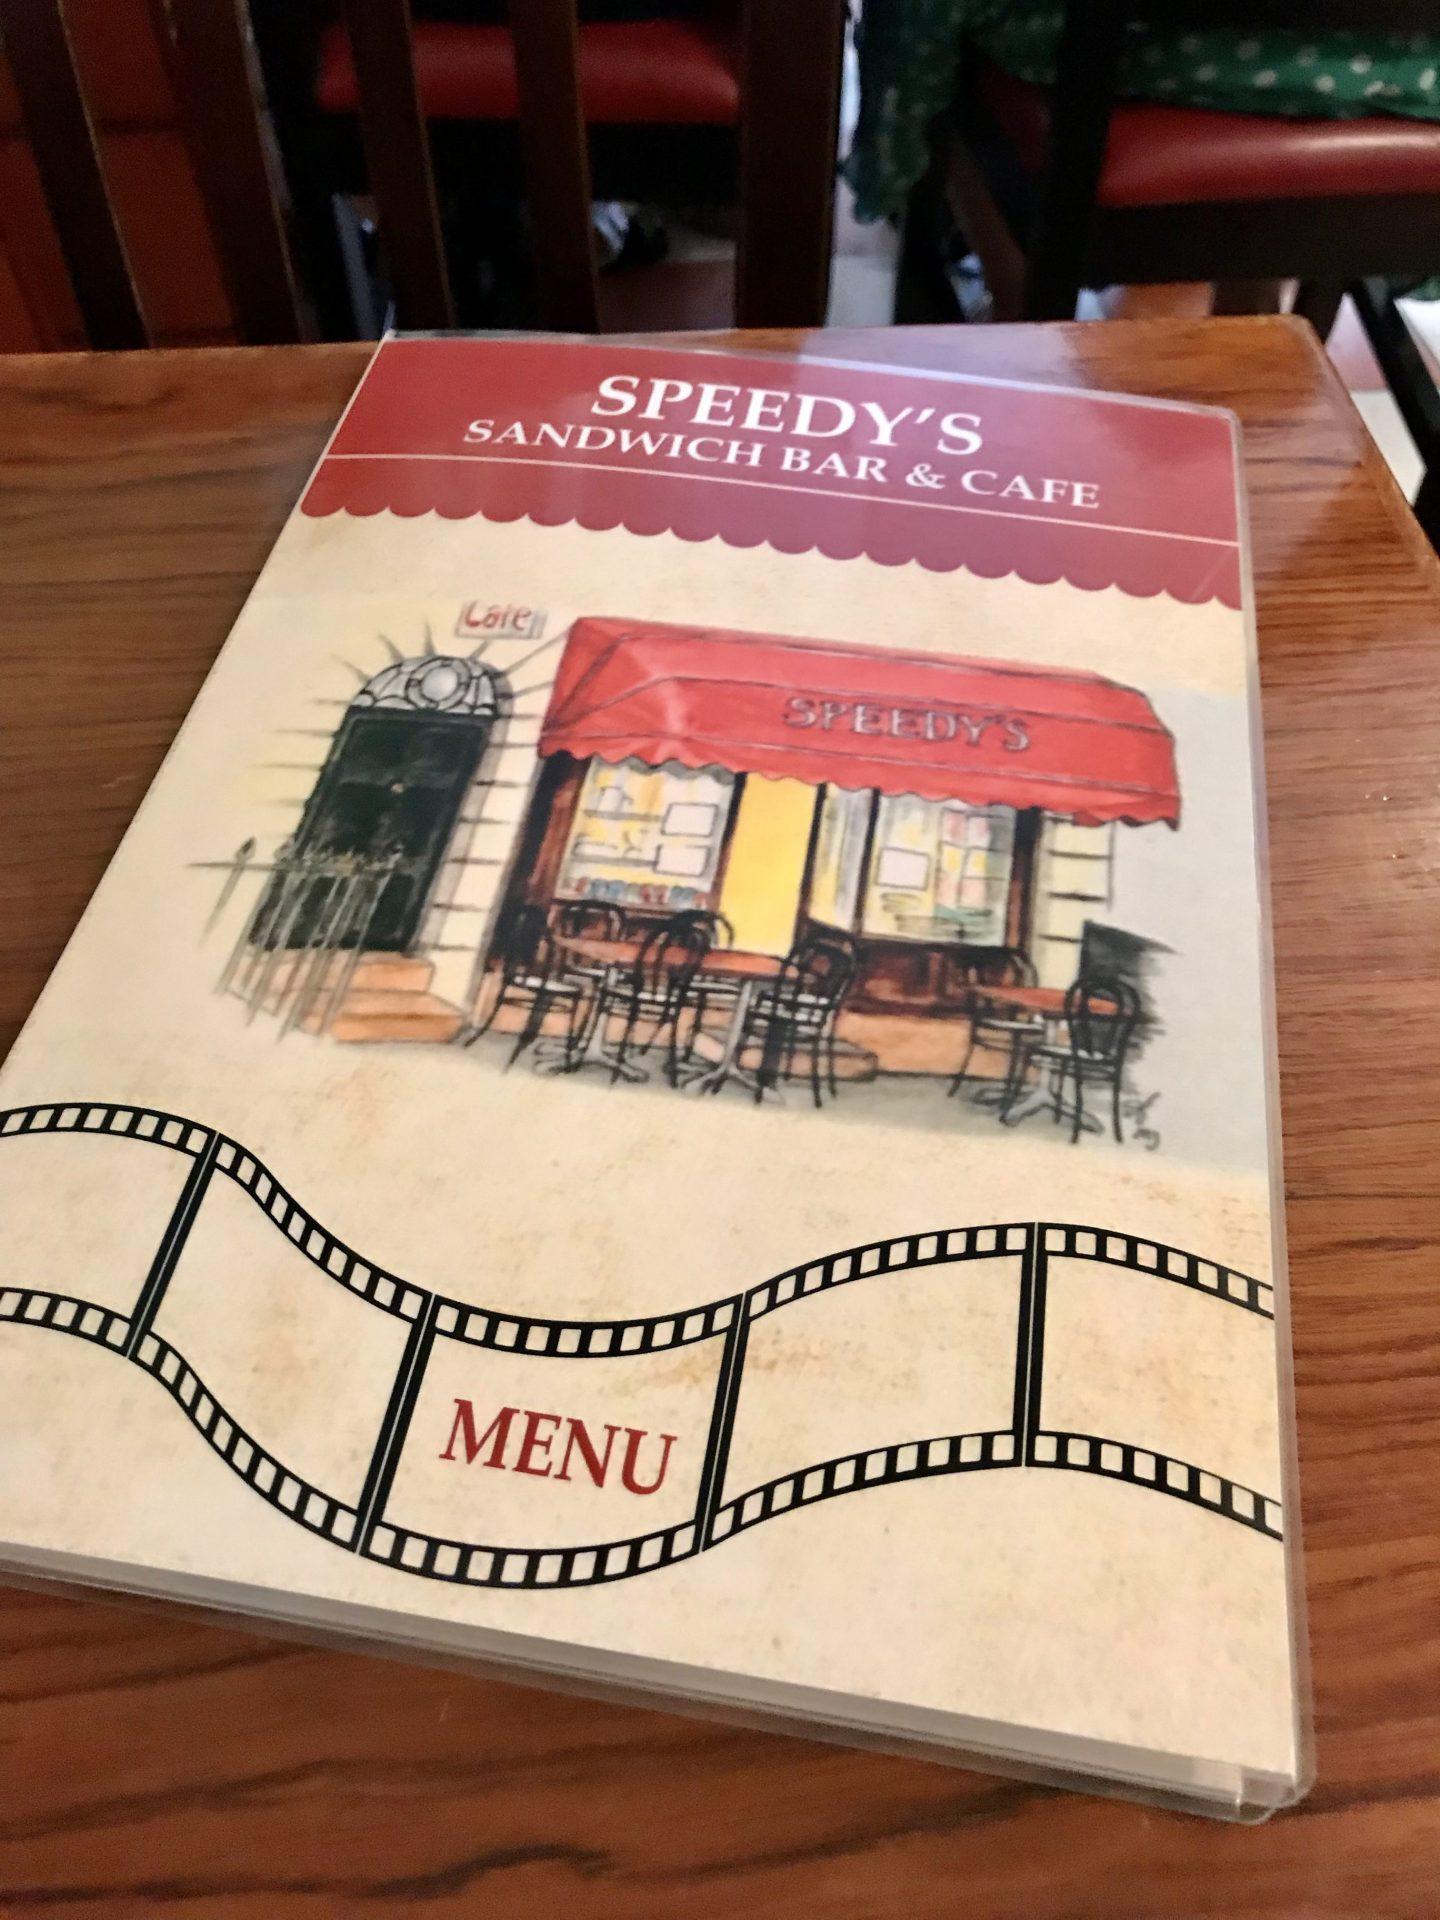 Sherlock speedys cafe menu London